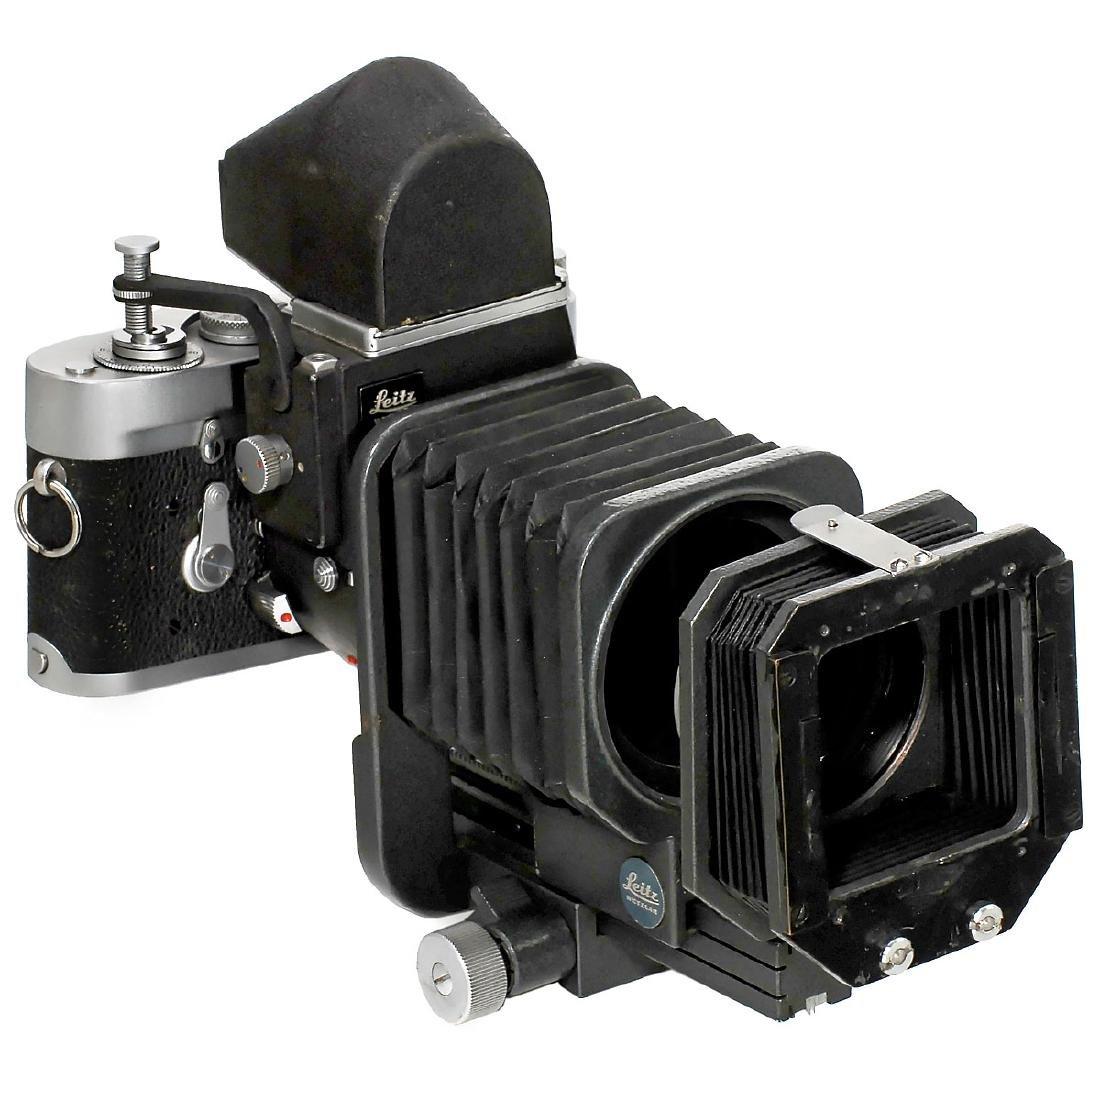 Leica M2 with Visoflex III, 1966